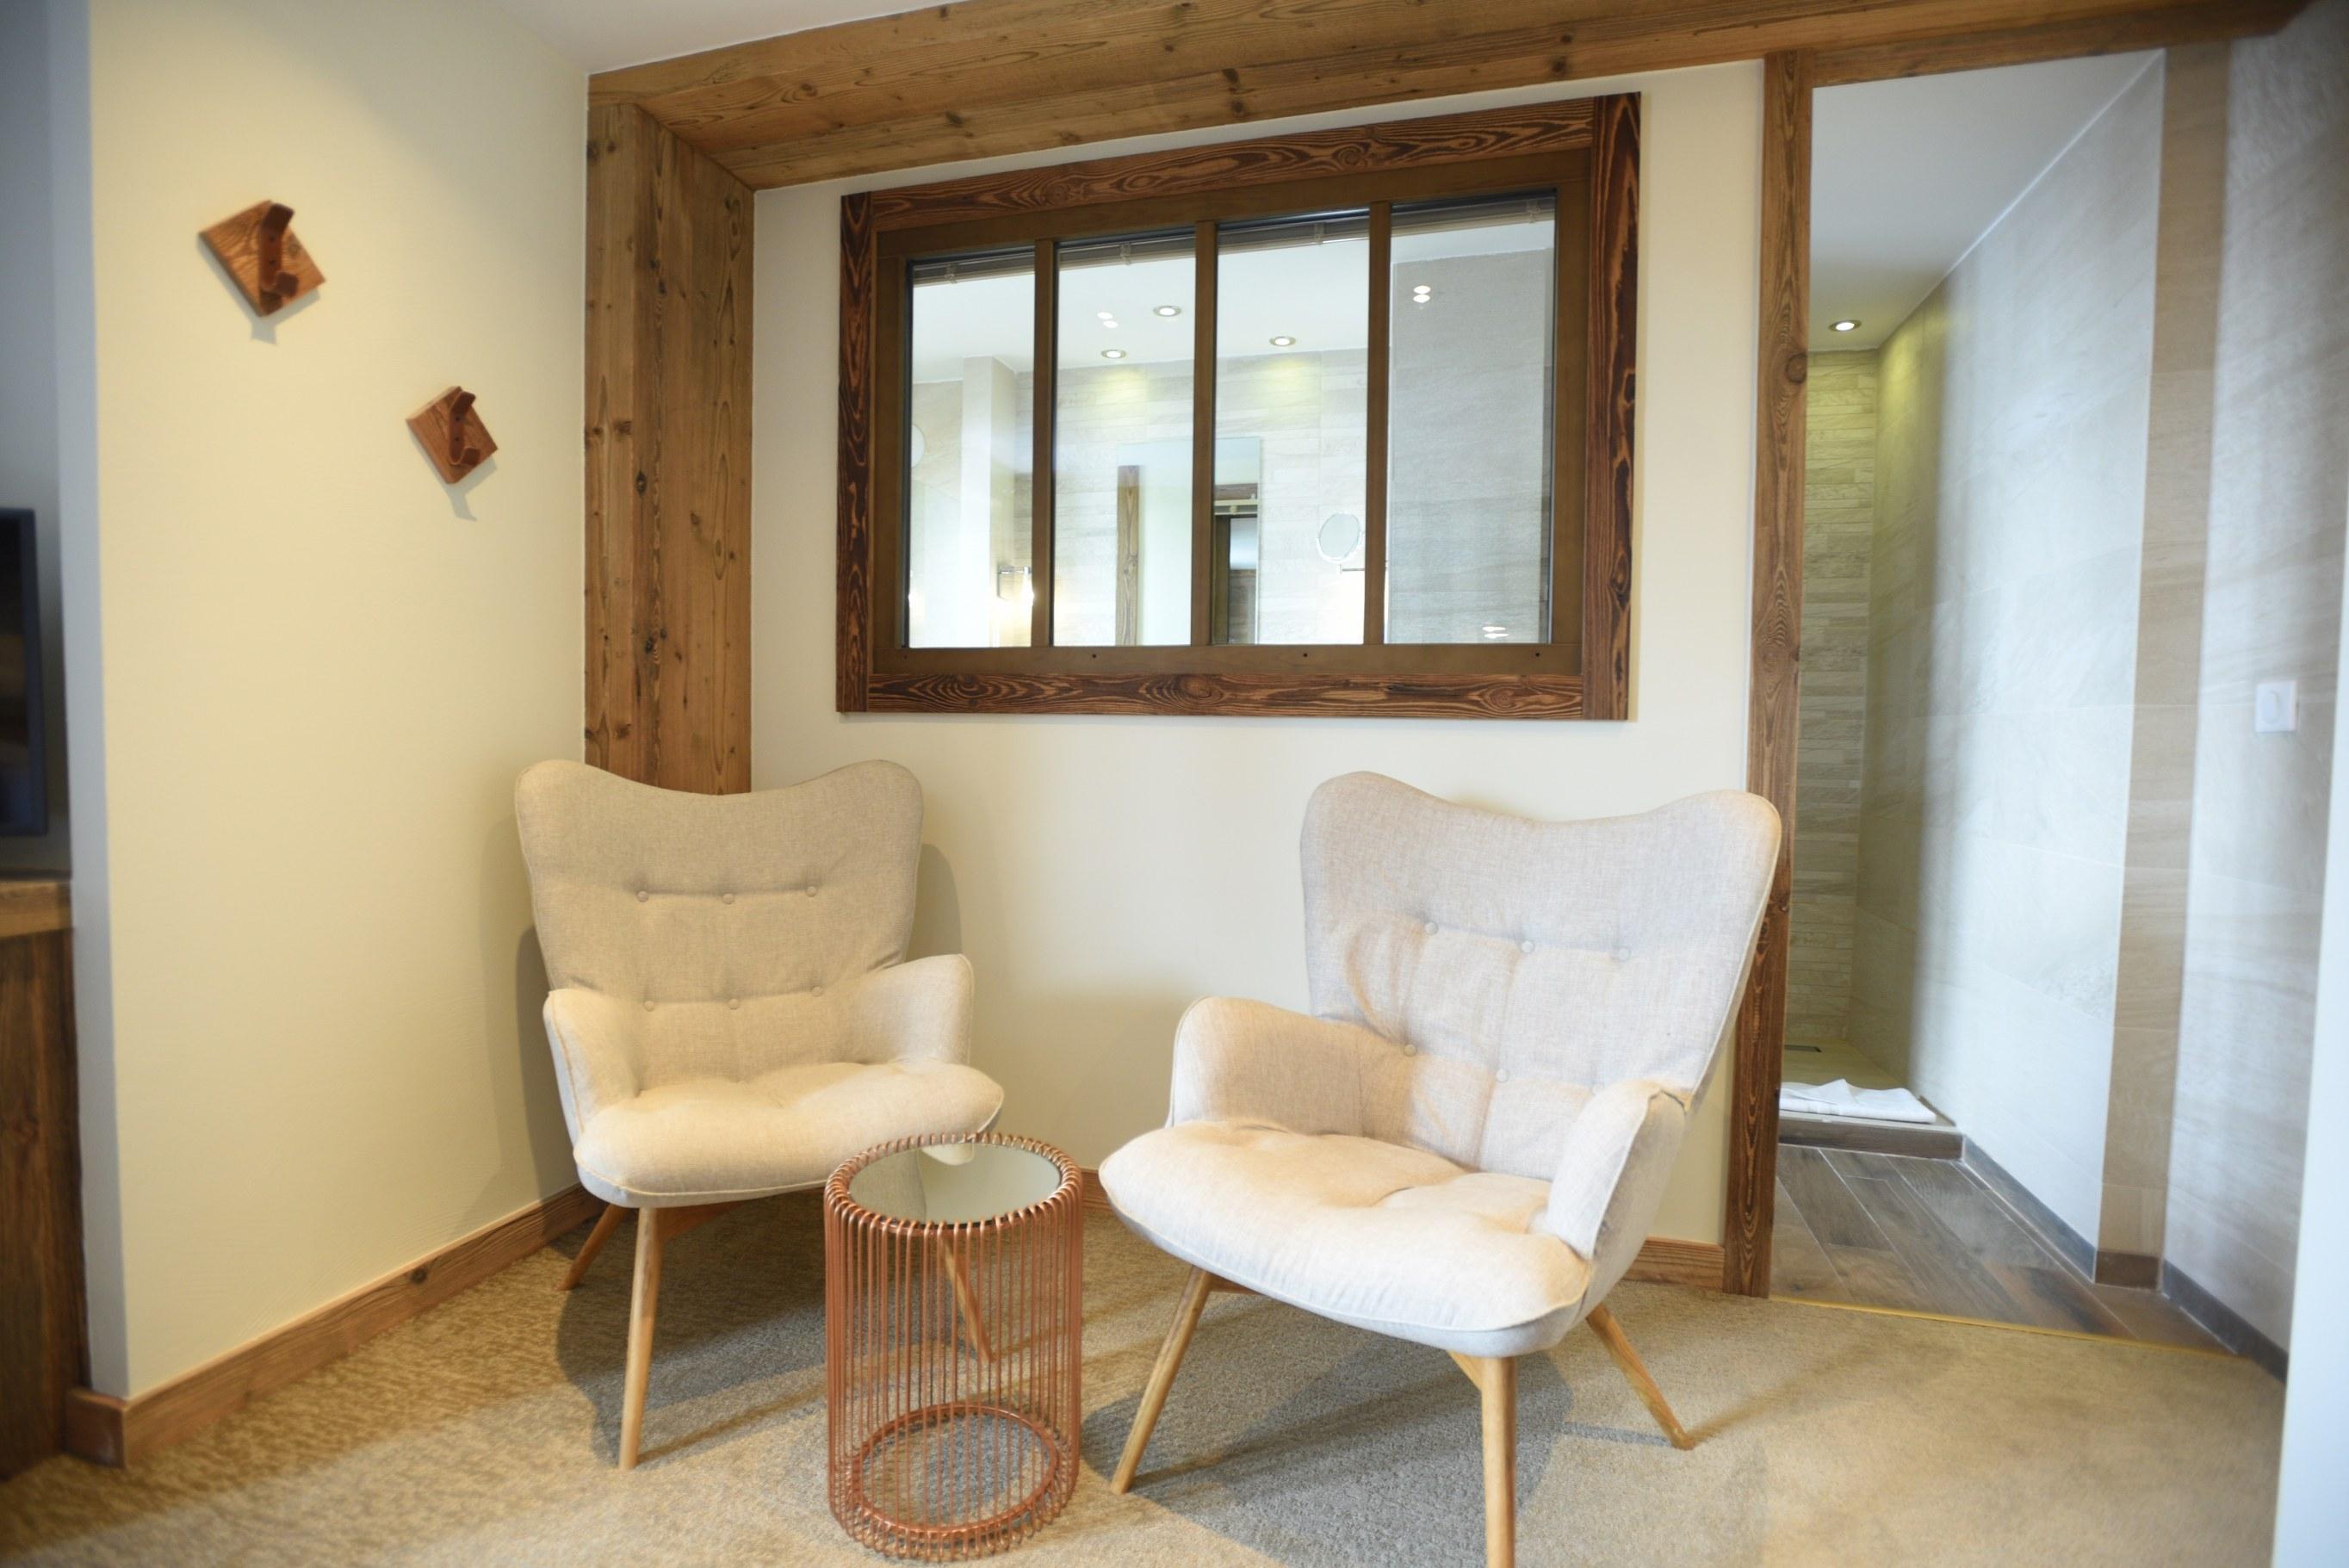 hotel-4-étoiles-val-isere-chambre-confort-salon